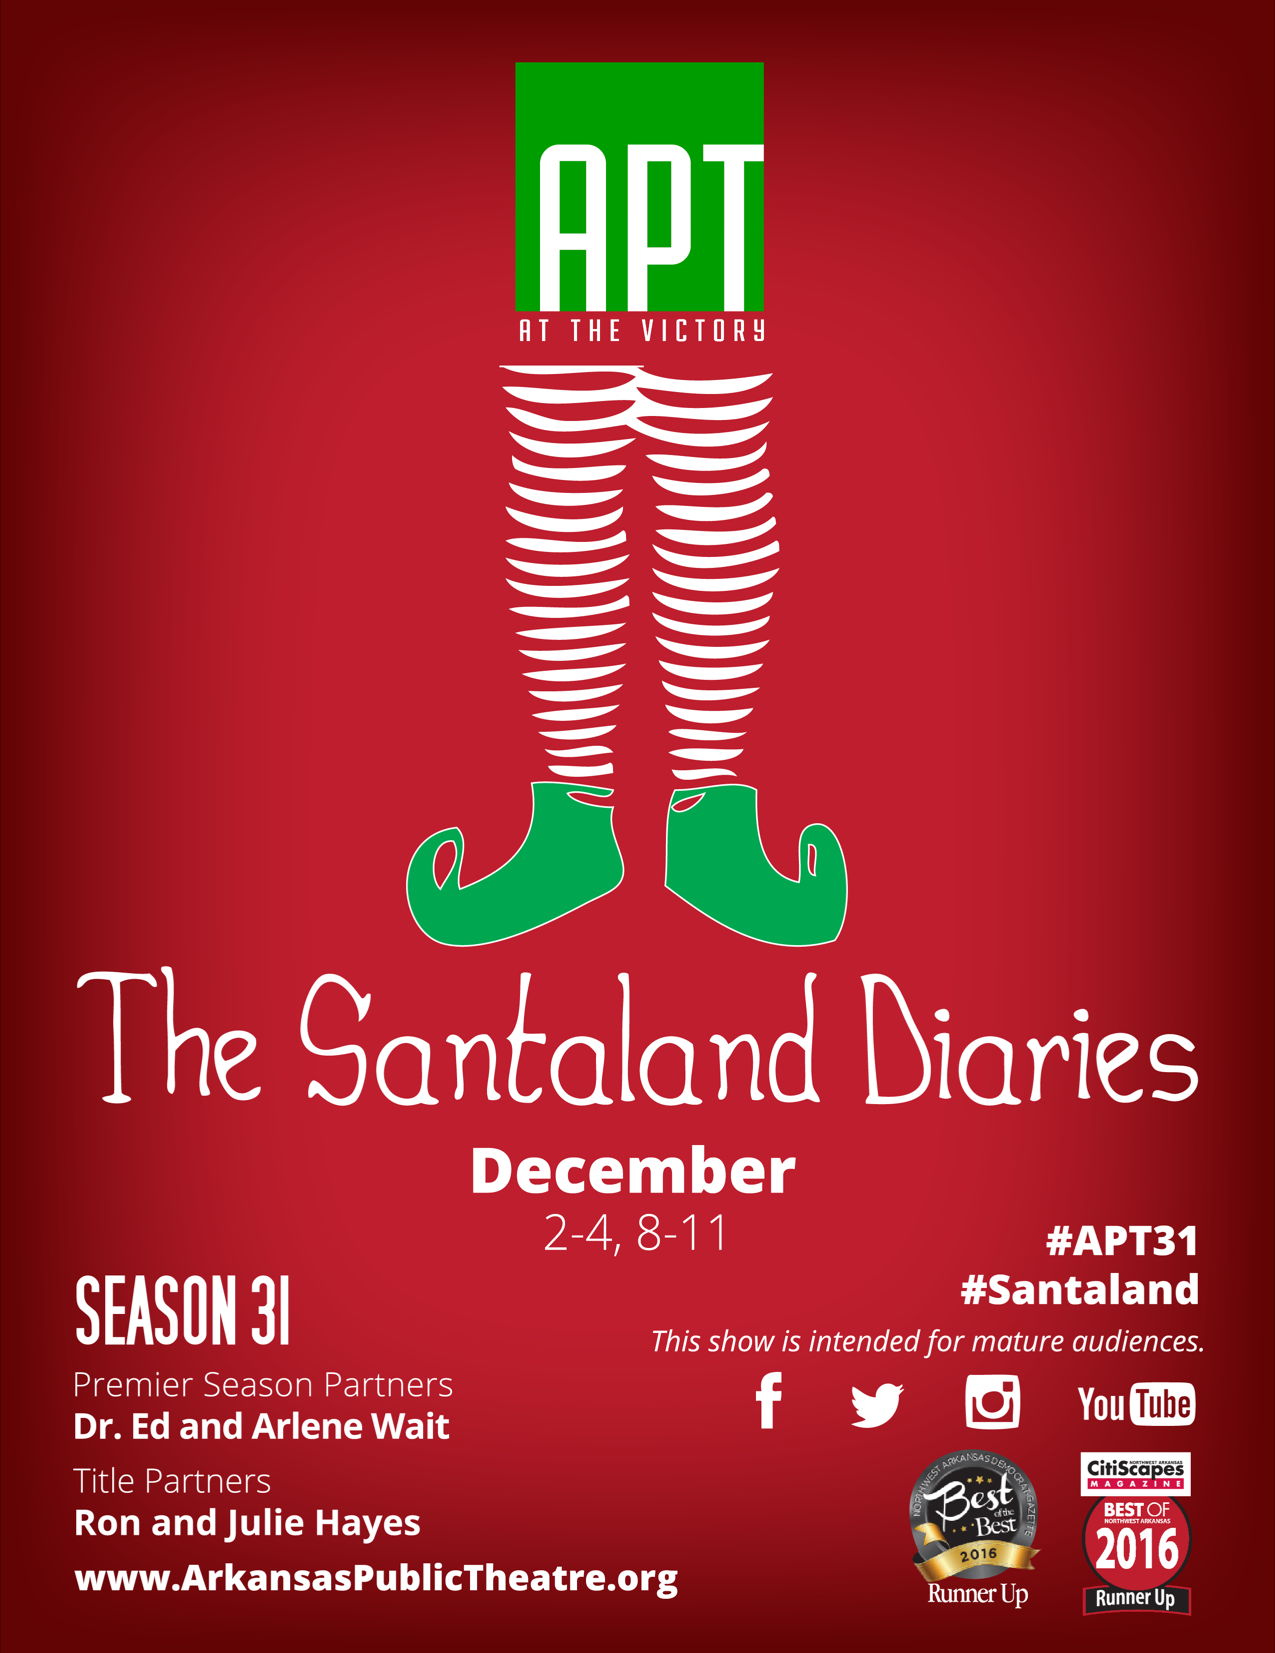 Season 31 | THE SANTALAND DIARIES